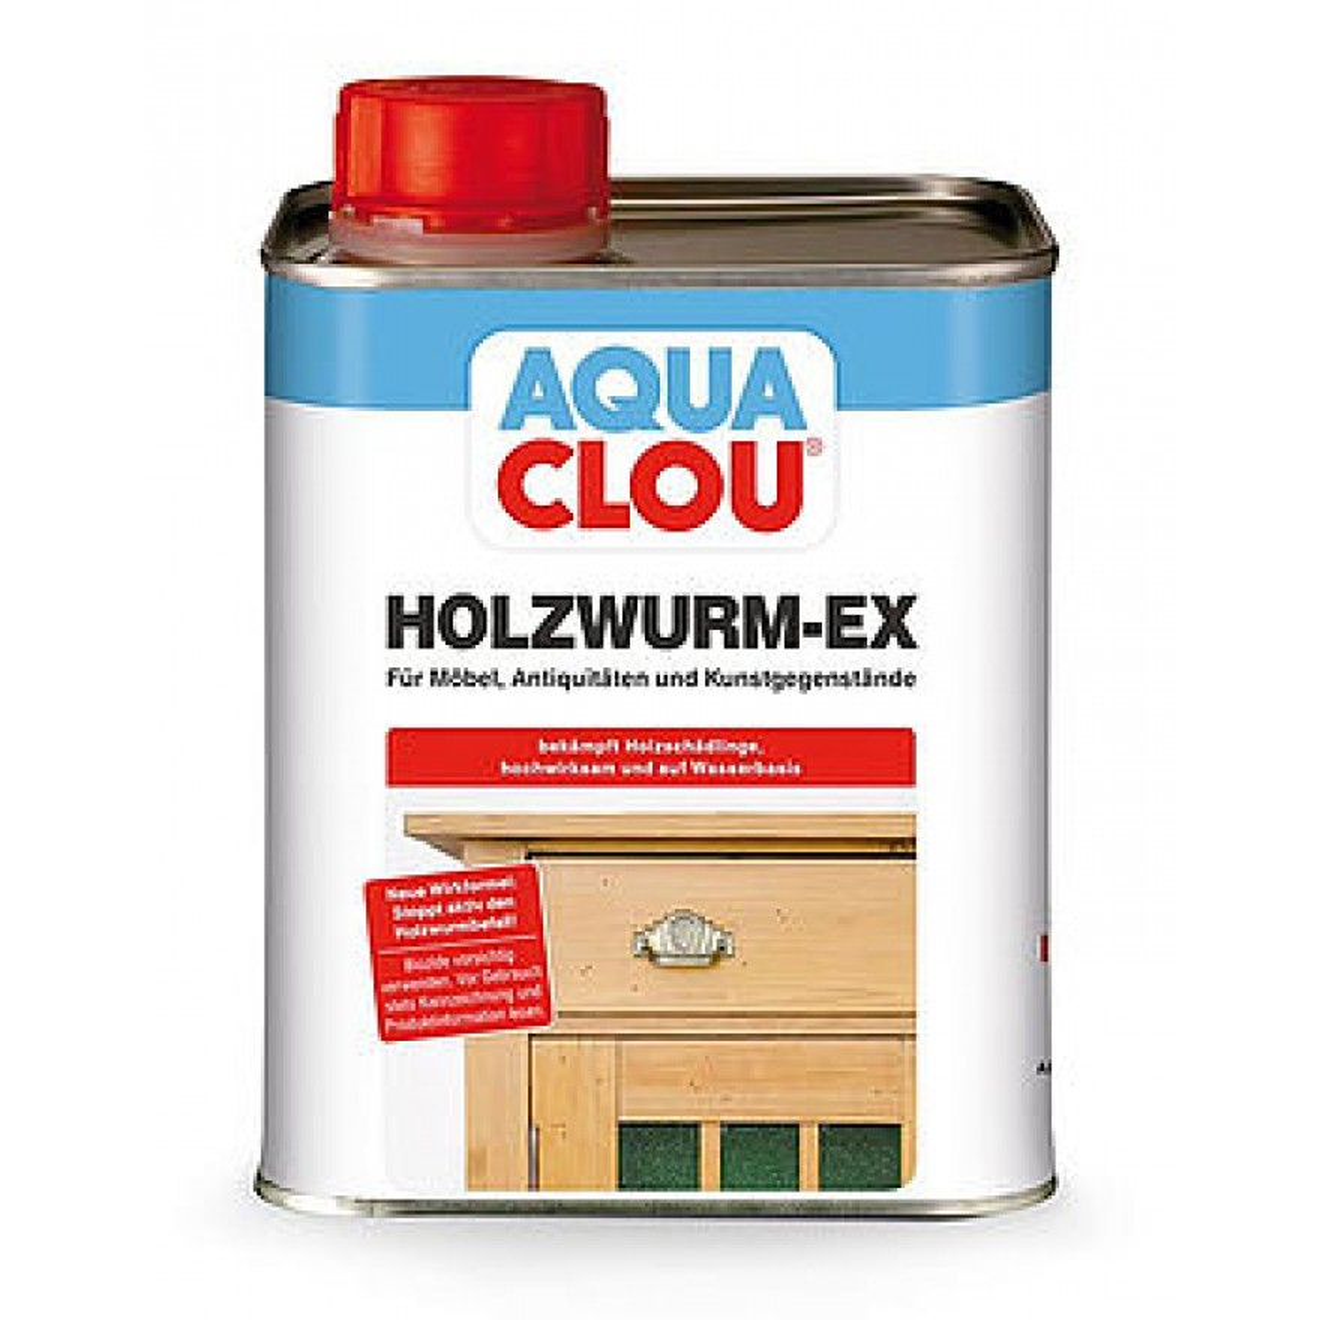 aqua clou holzwurm ex holzzerst rende insektenlarven wie. Black Bedroom Furniture Sets. Home Design Ideas